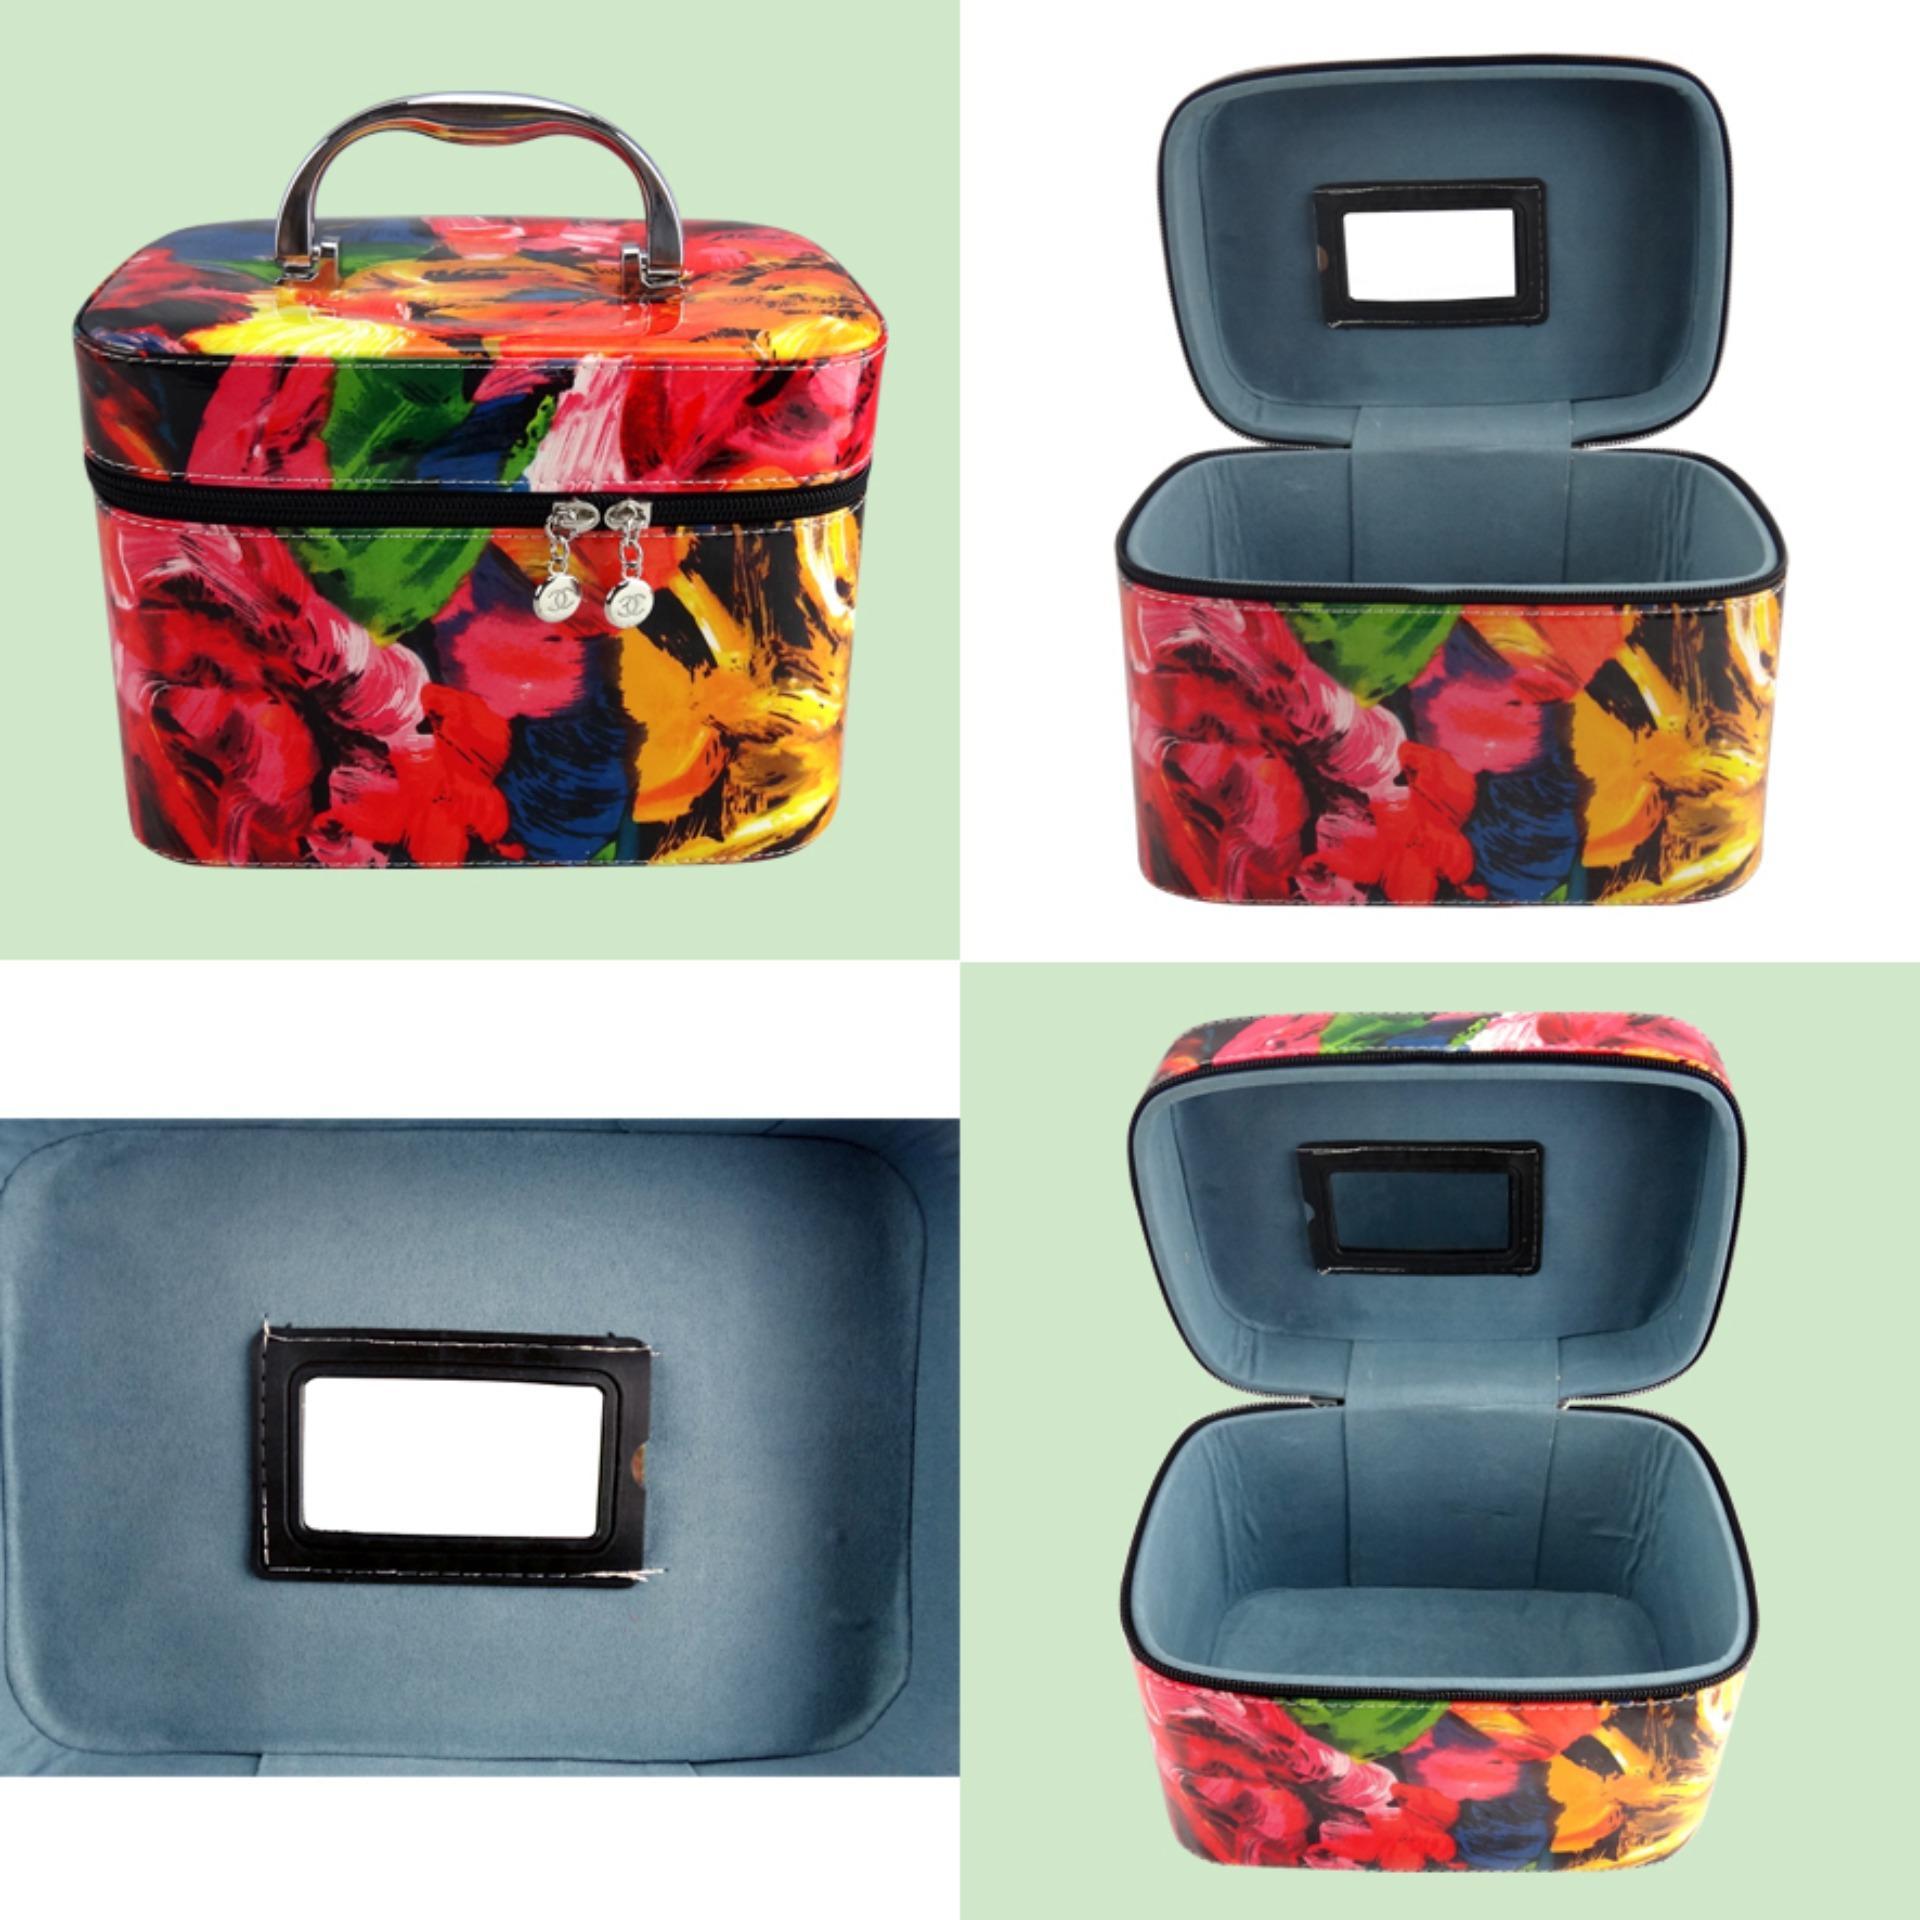 Beau Kotak Kosmetik / Cosmetic Box Motif Bunga Abstrak 213 Size M -002 .